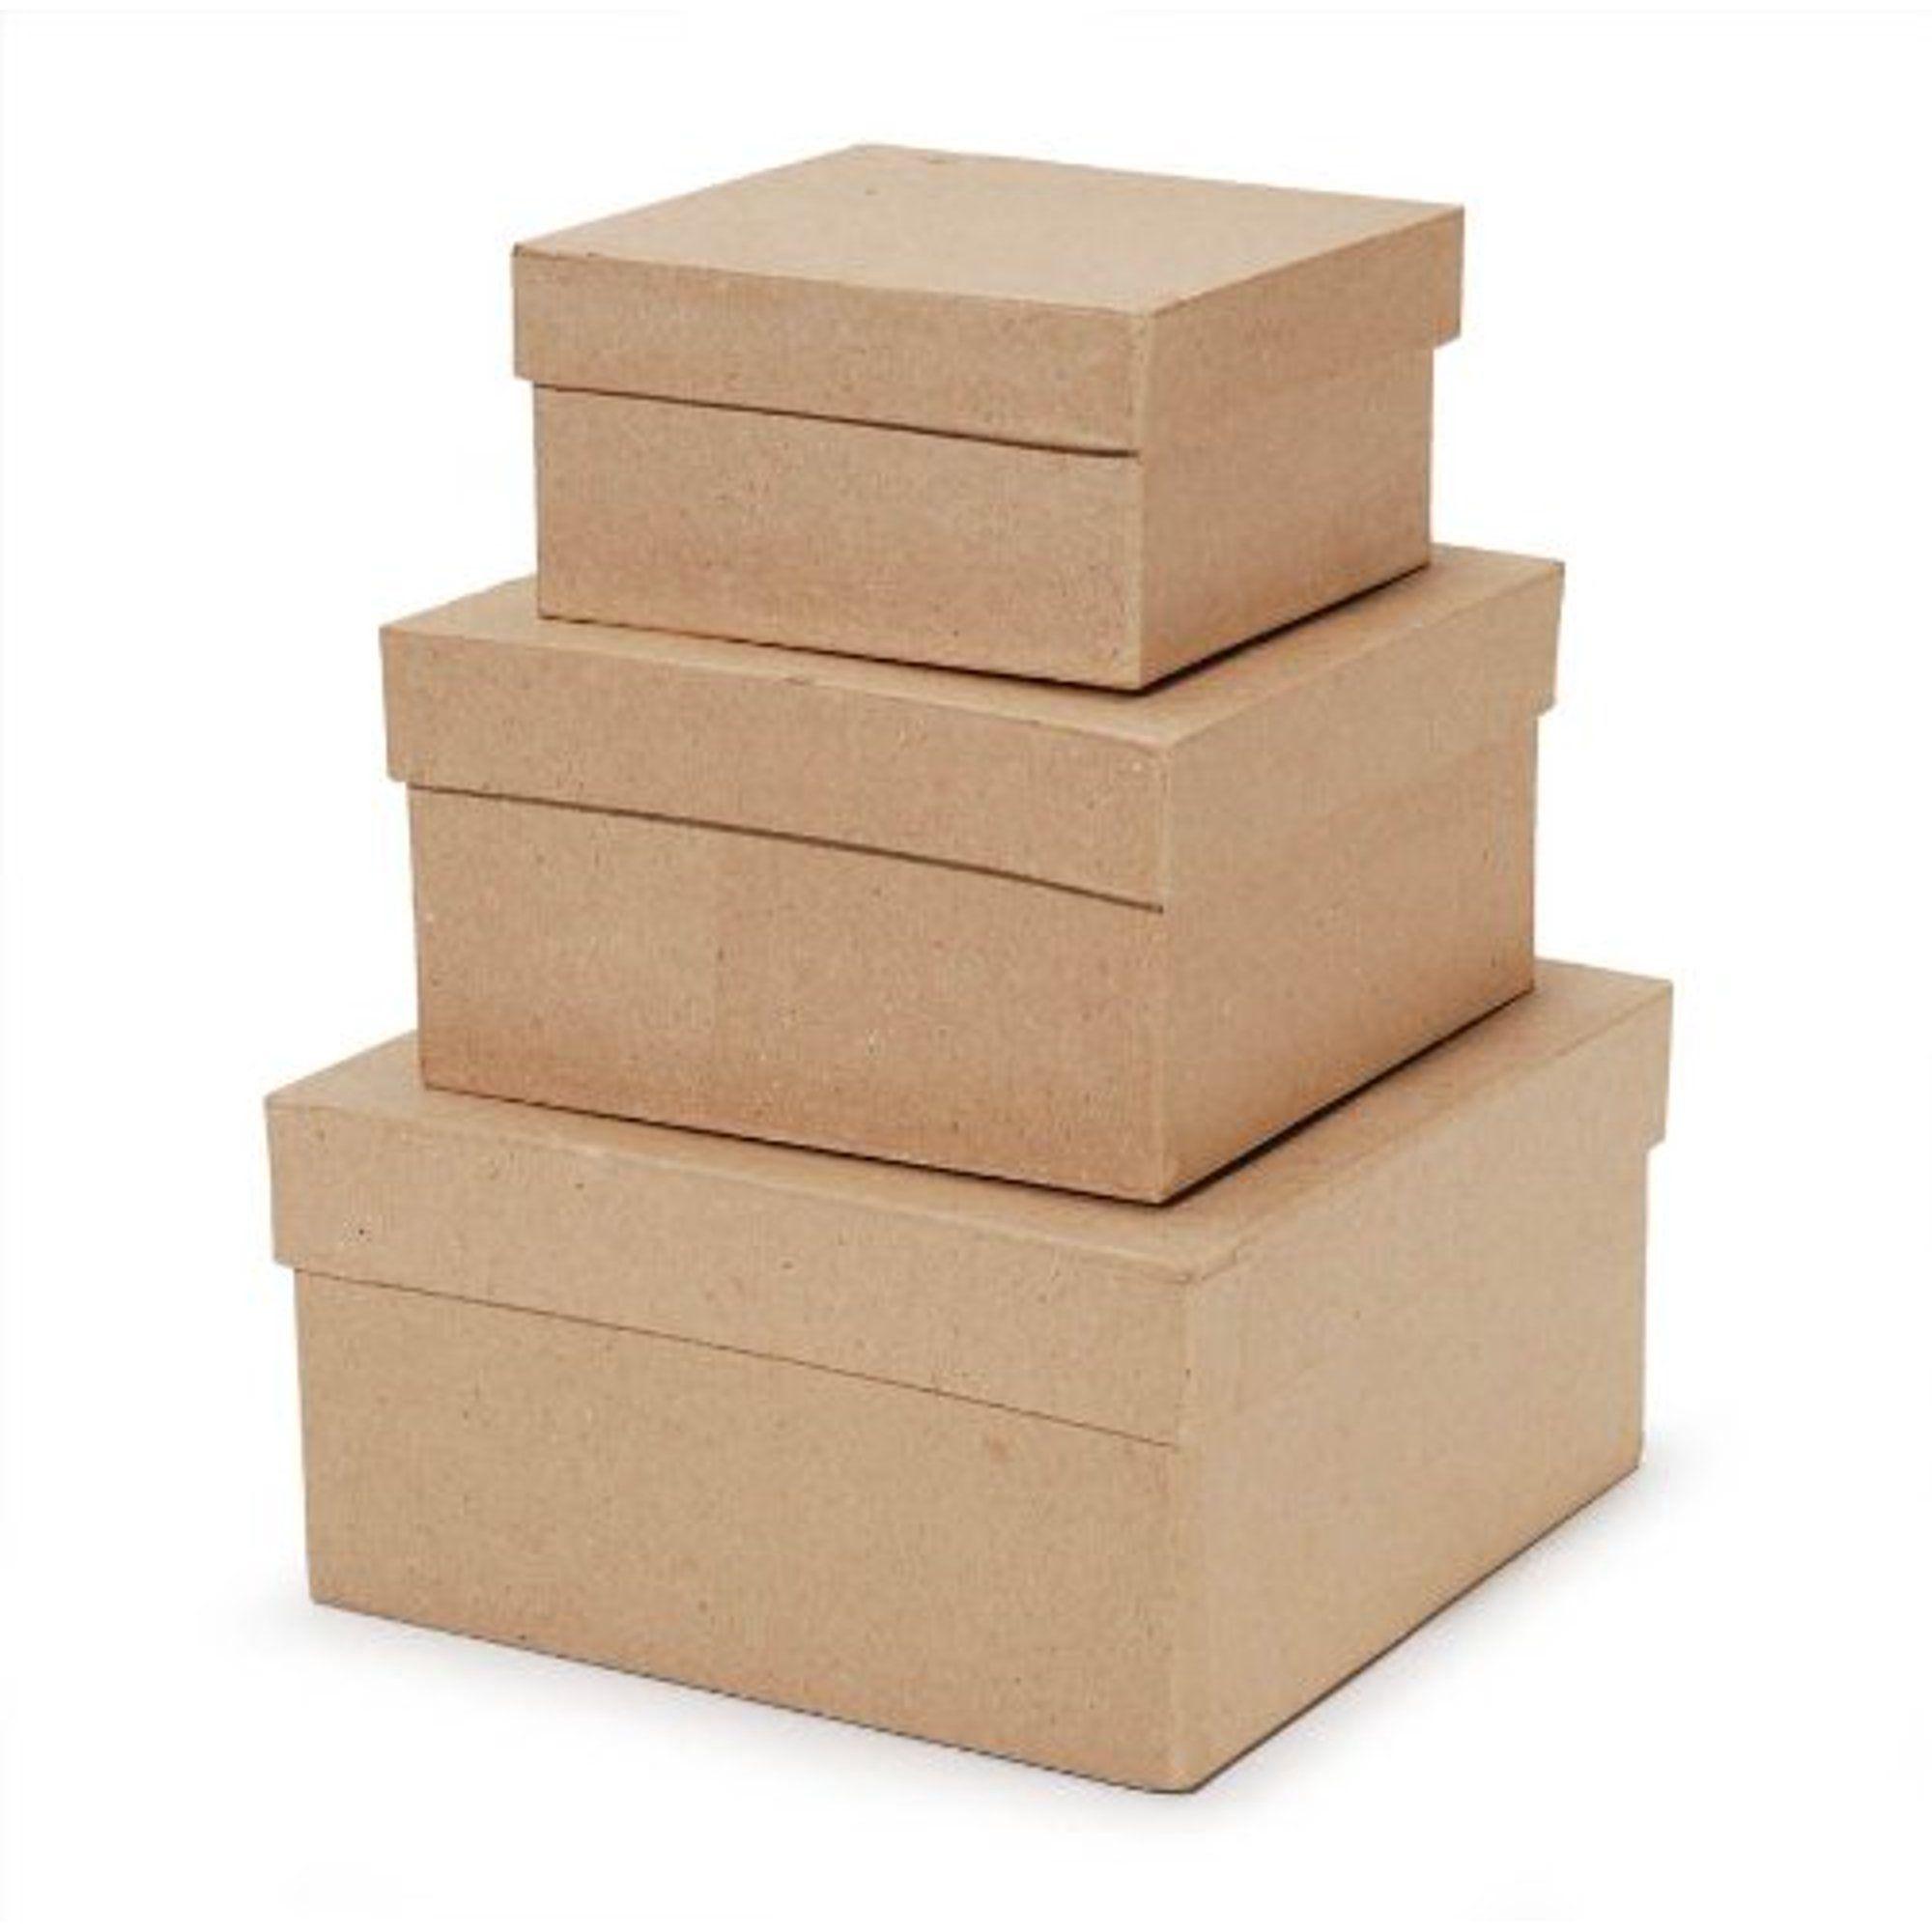 Paper Mache Square Box Set of 3 -   19 diy Box art ideas